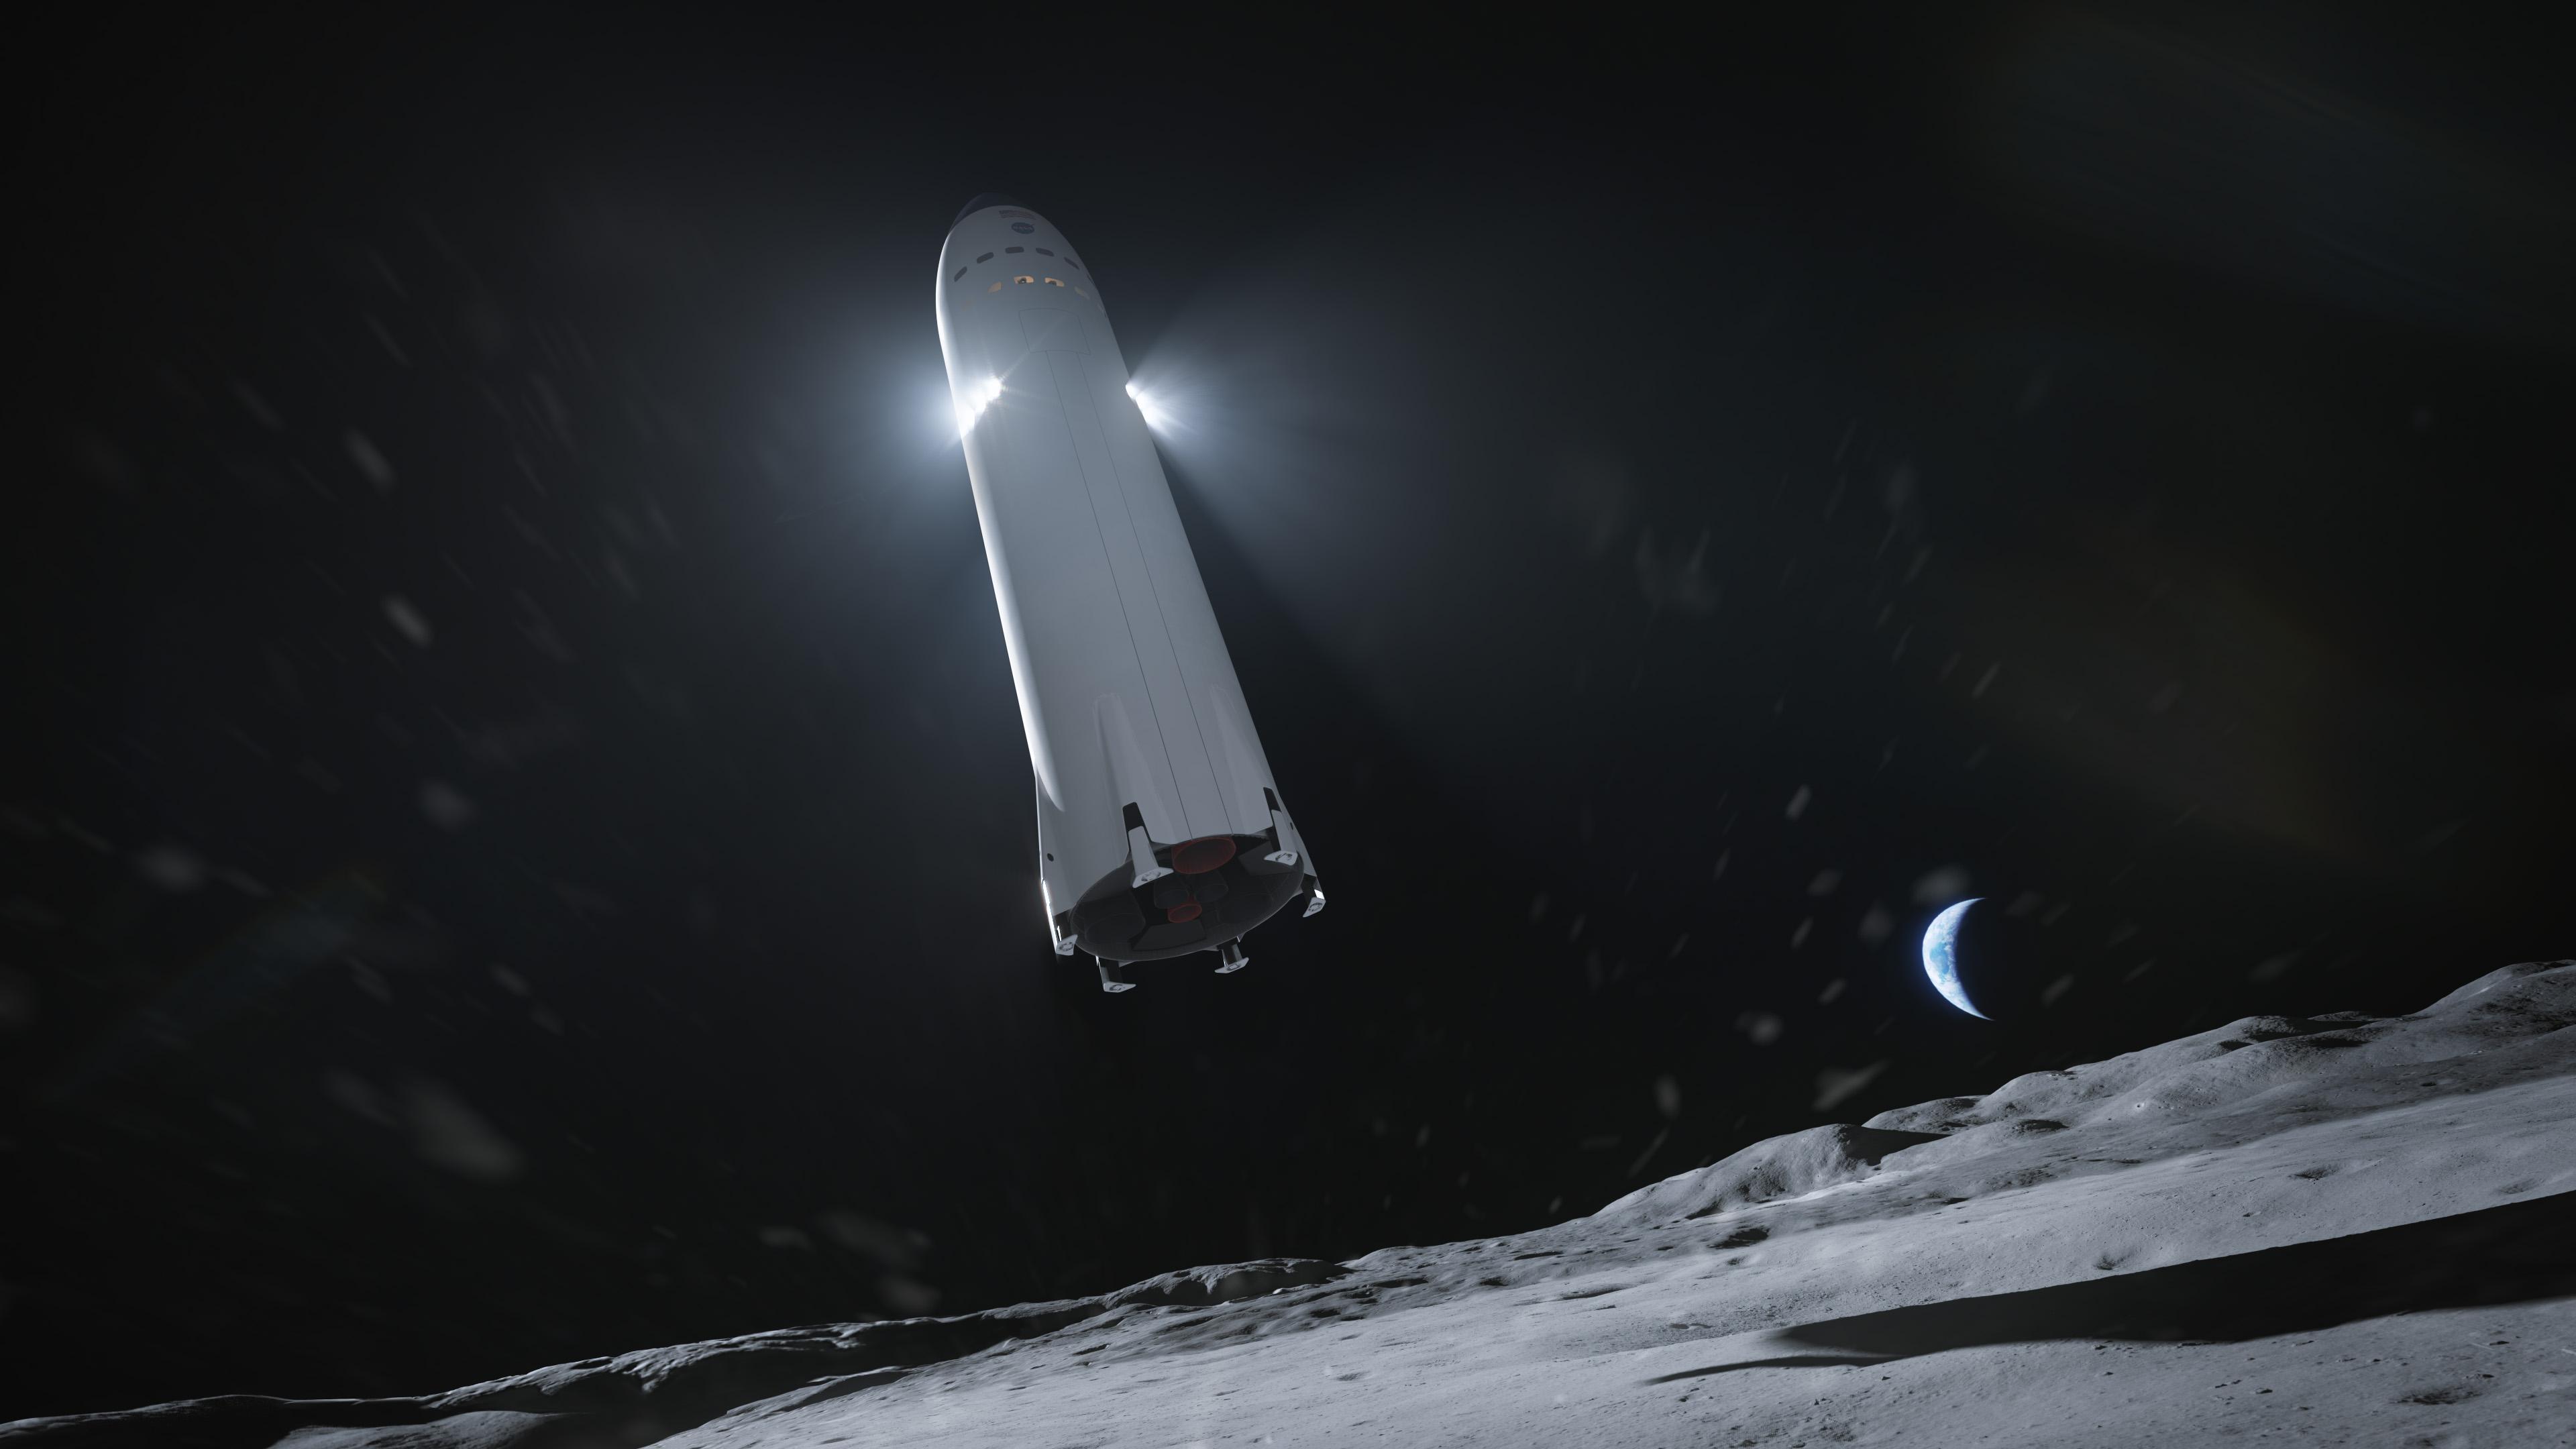 [Artemis] Atterrisseur habité (Crewed Lunar Lander) - Page 6 EW3eU9BU8AA0HYr?format=jpg&name=4096x4096